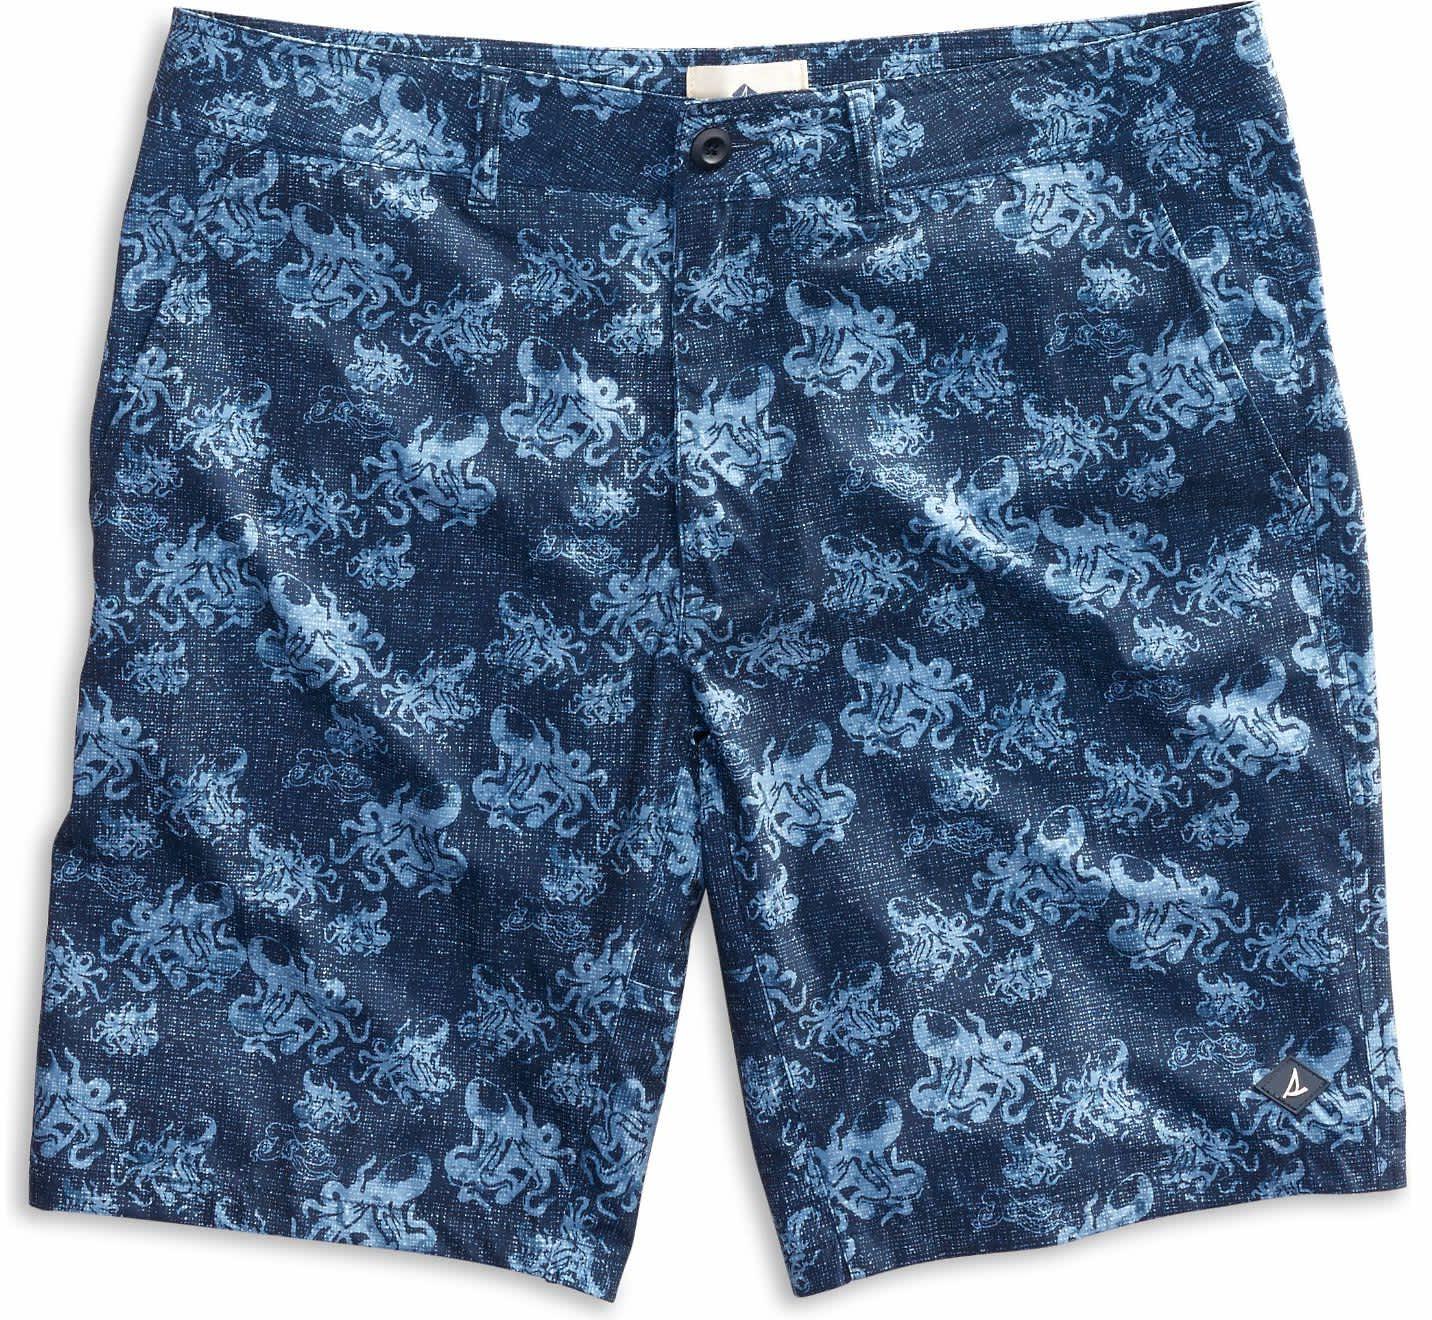 Sperry Men's Octopus Print Swim Shorts